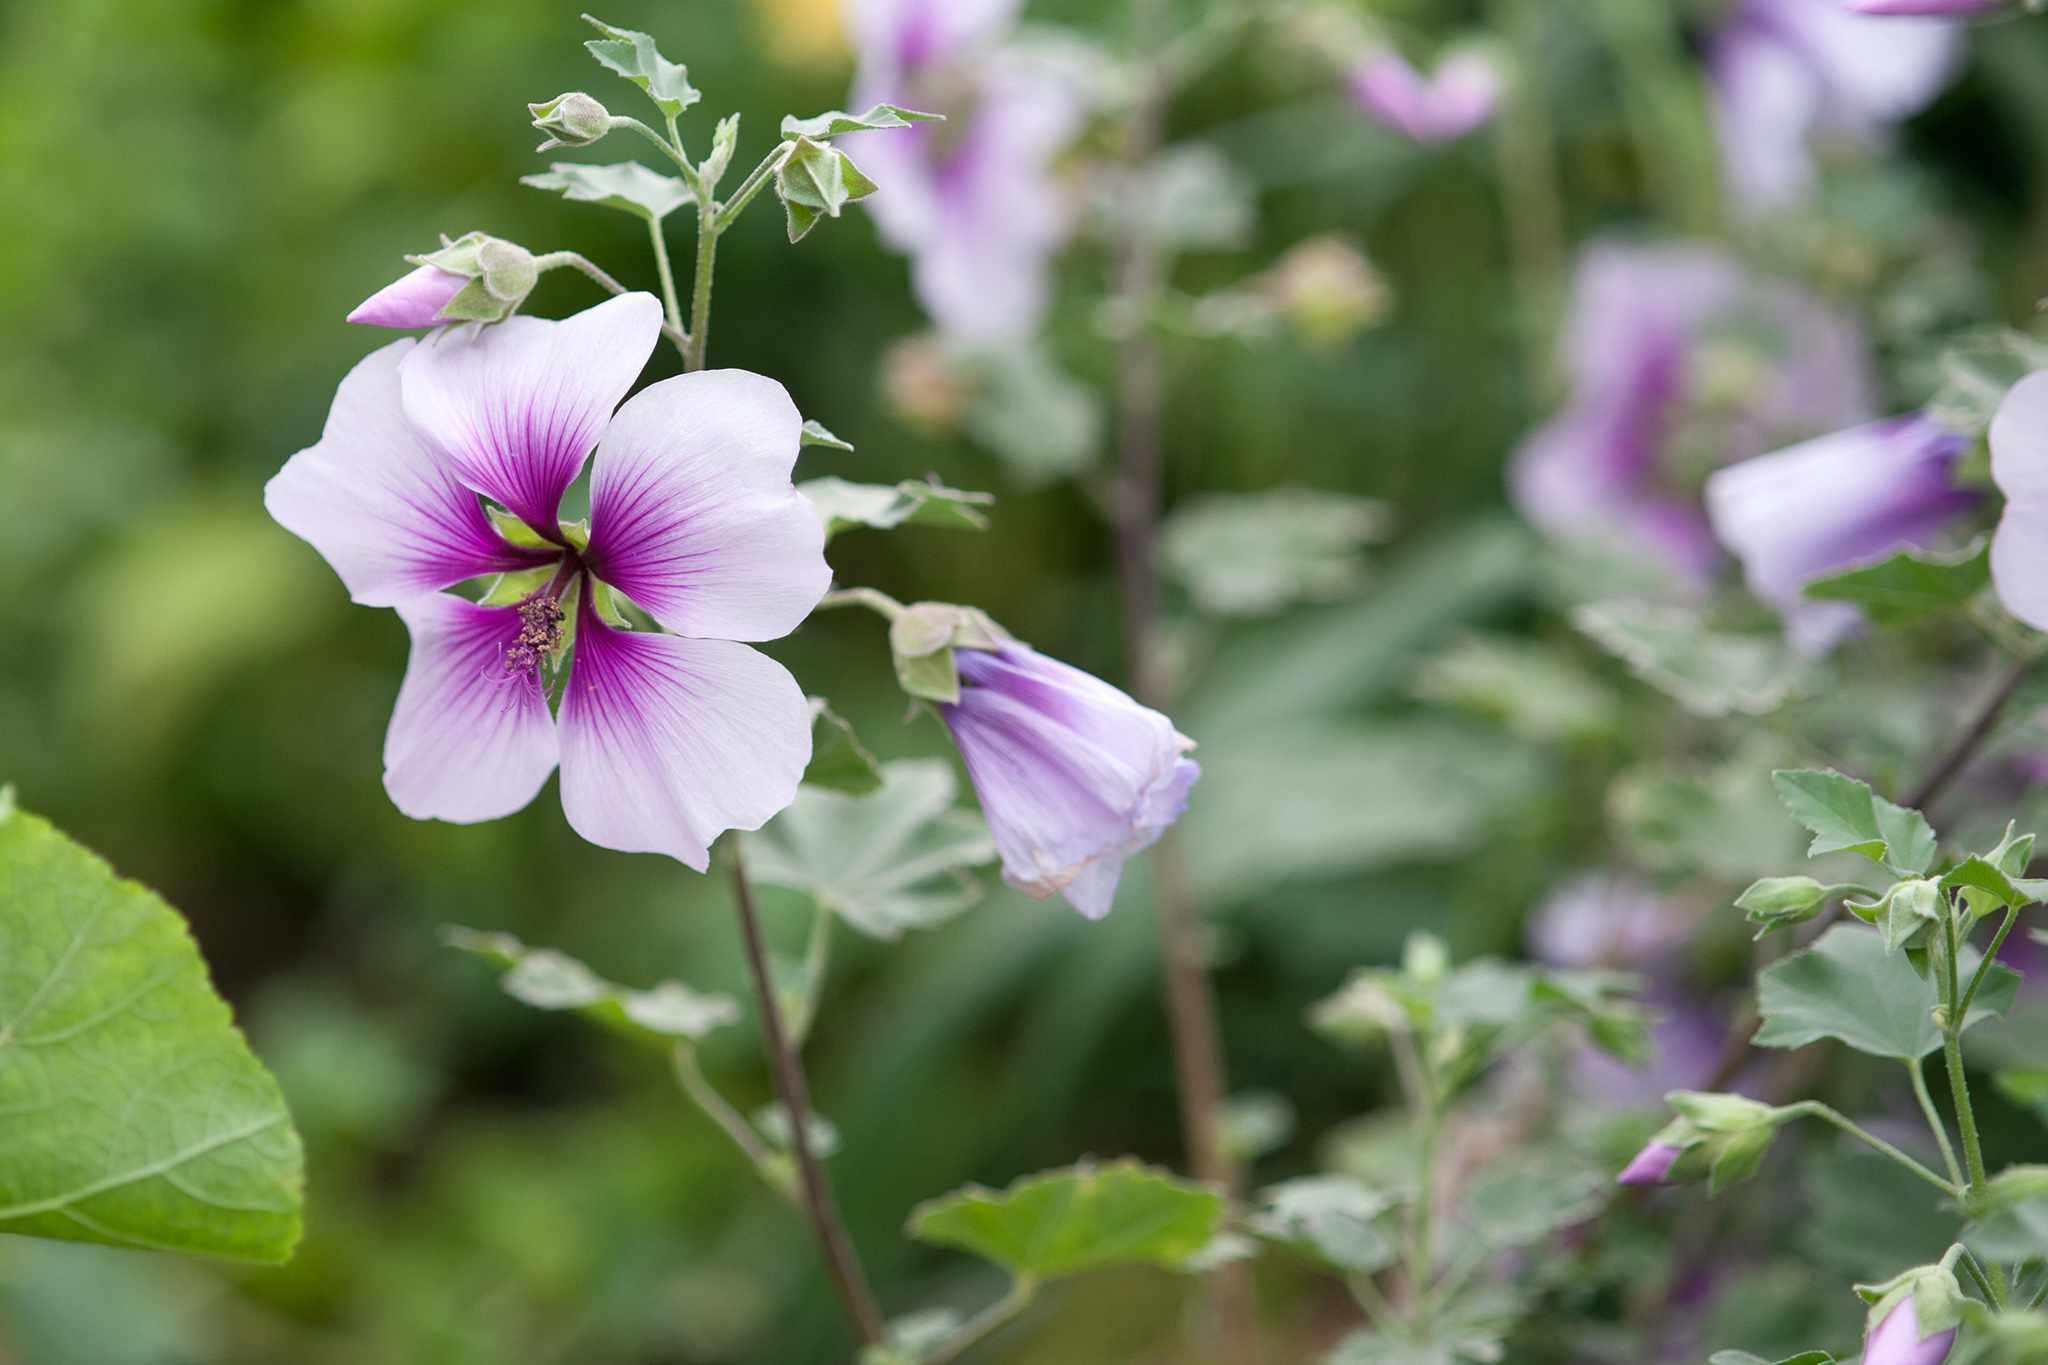 Mauve flowers of lavatera